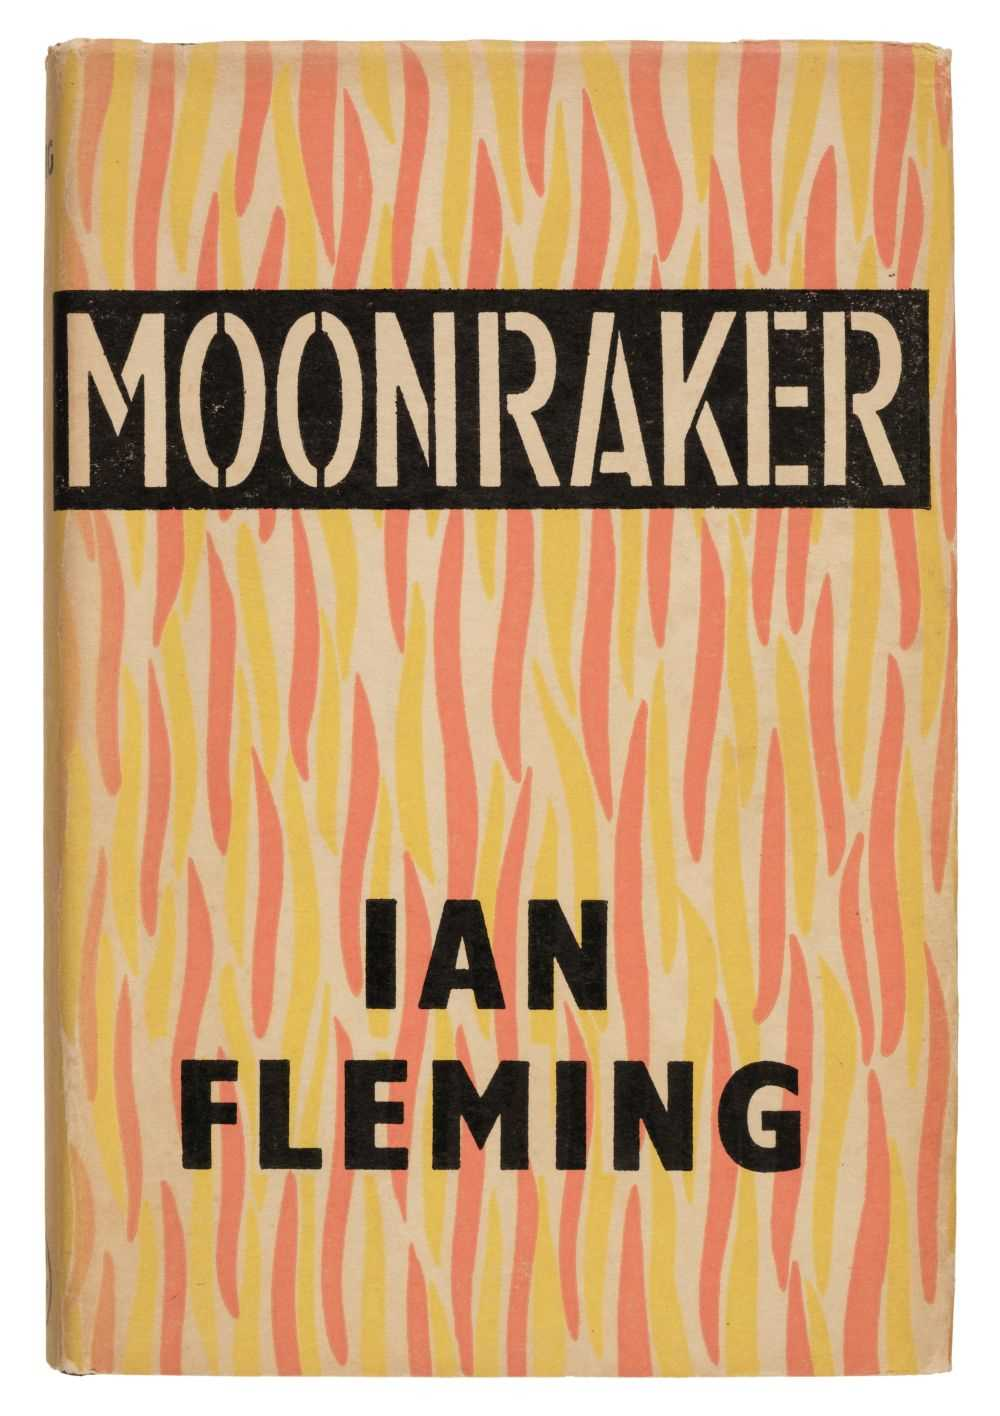 Lot 808 - Fleming (Ian). Moonraker, 1st edition, 1955